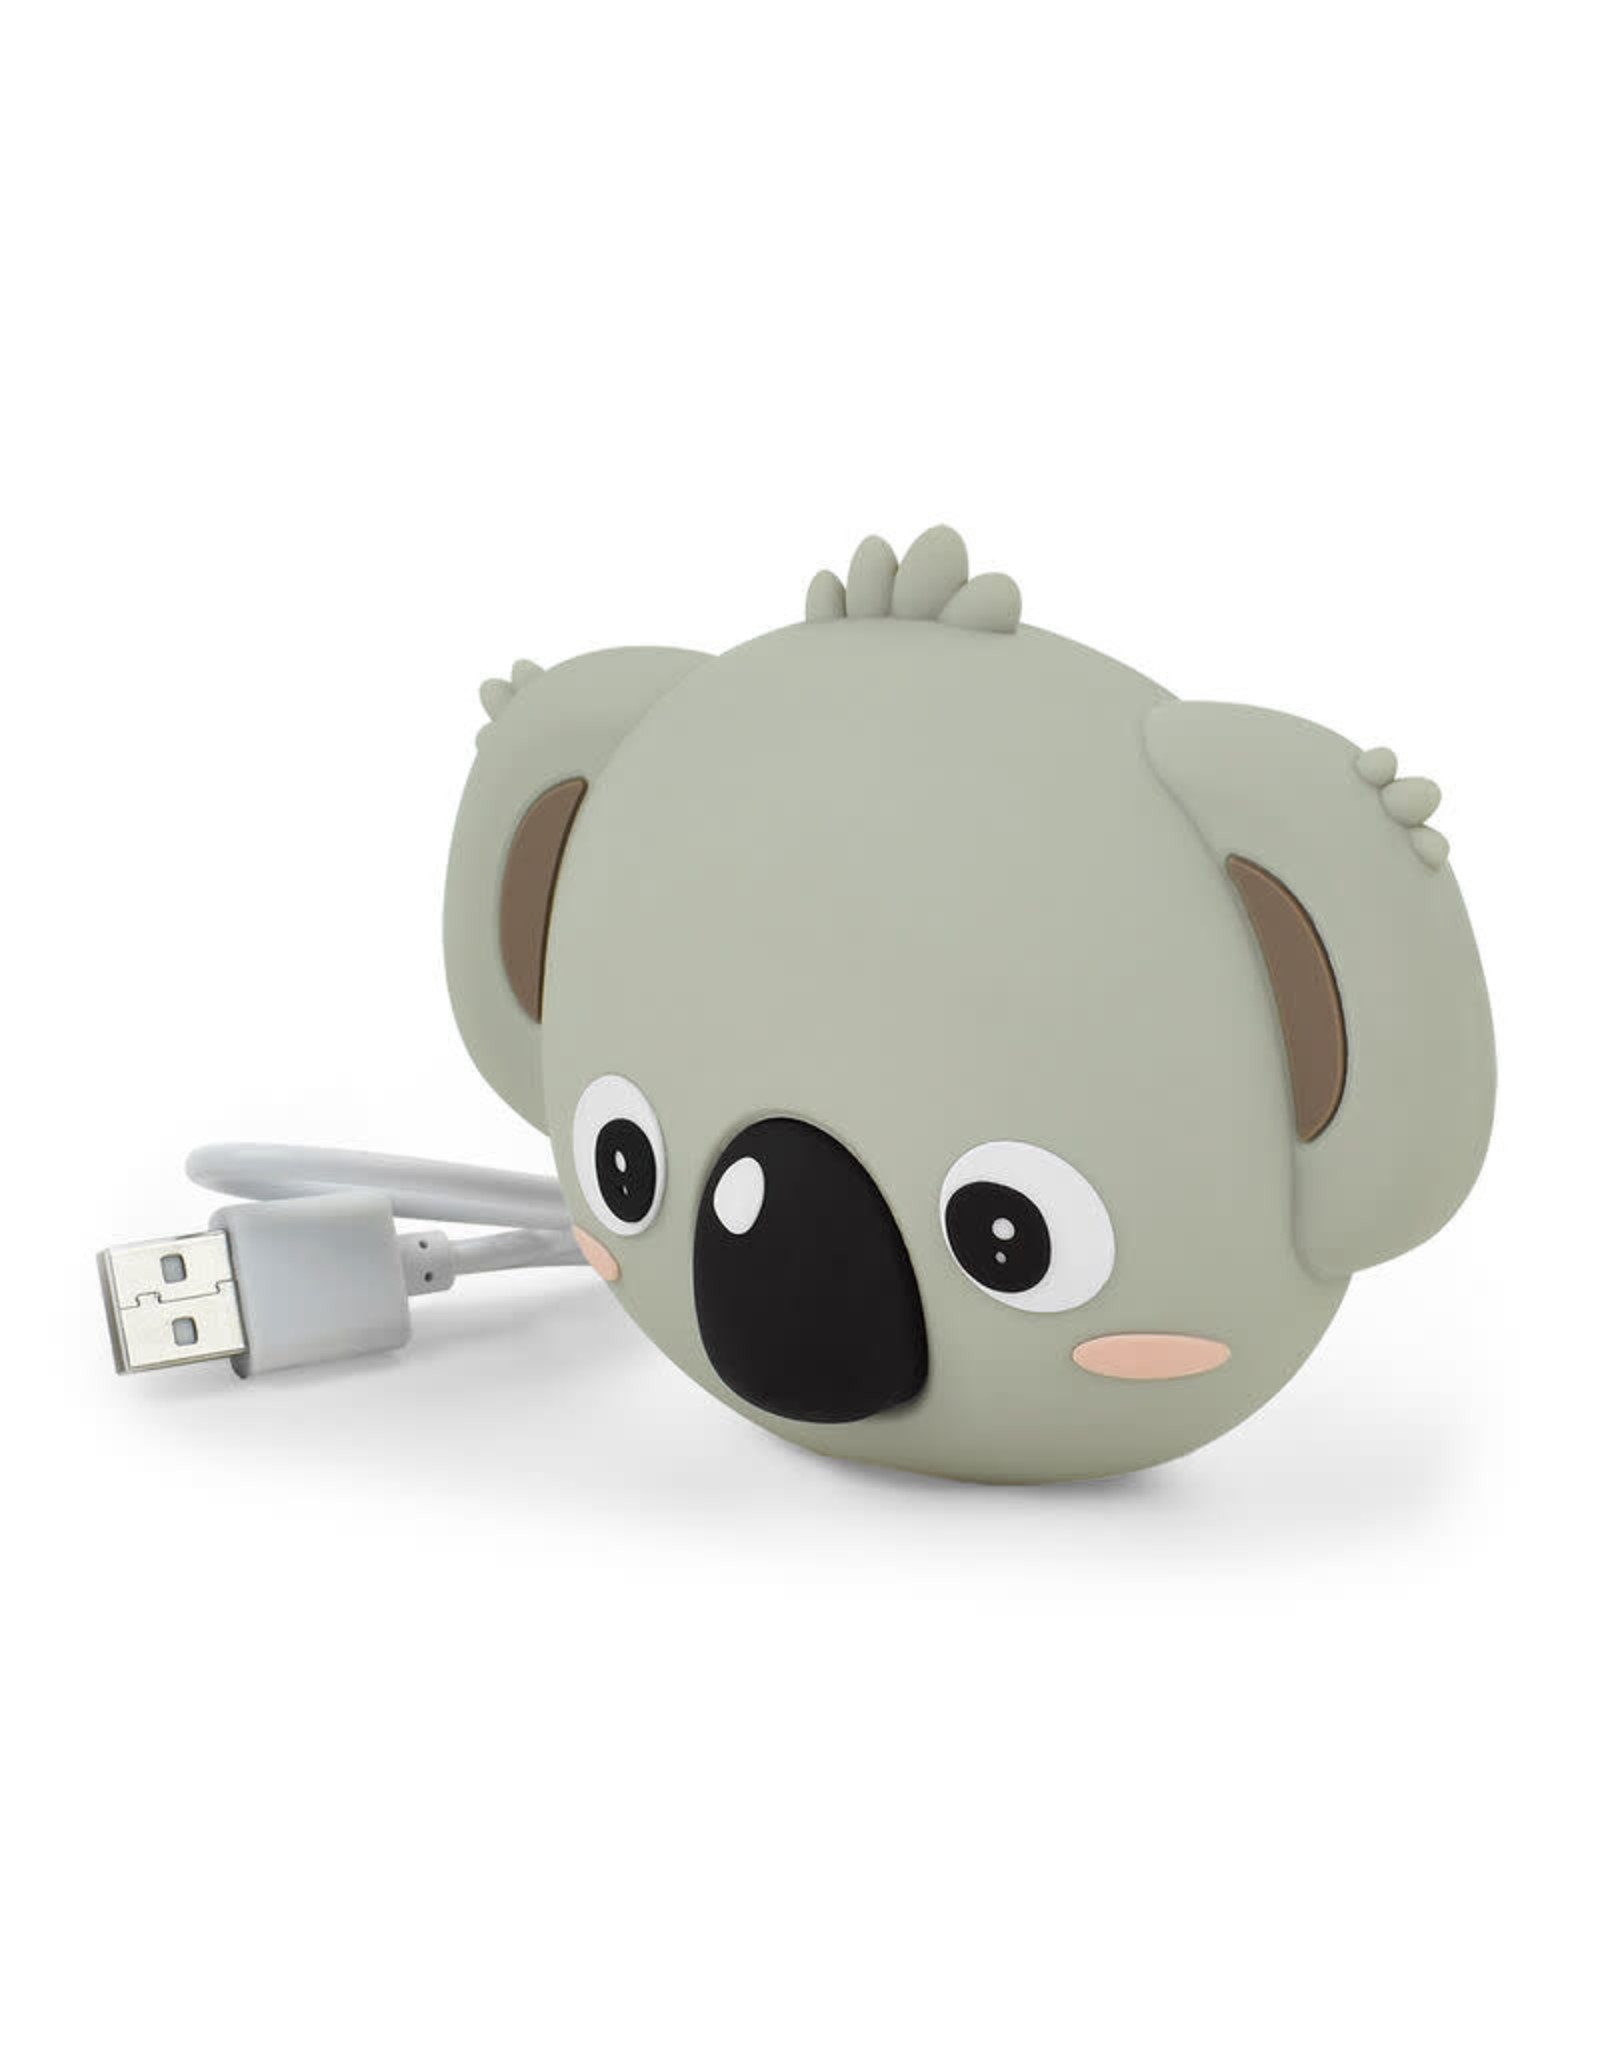 Powerbank koala